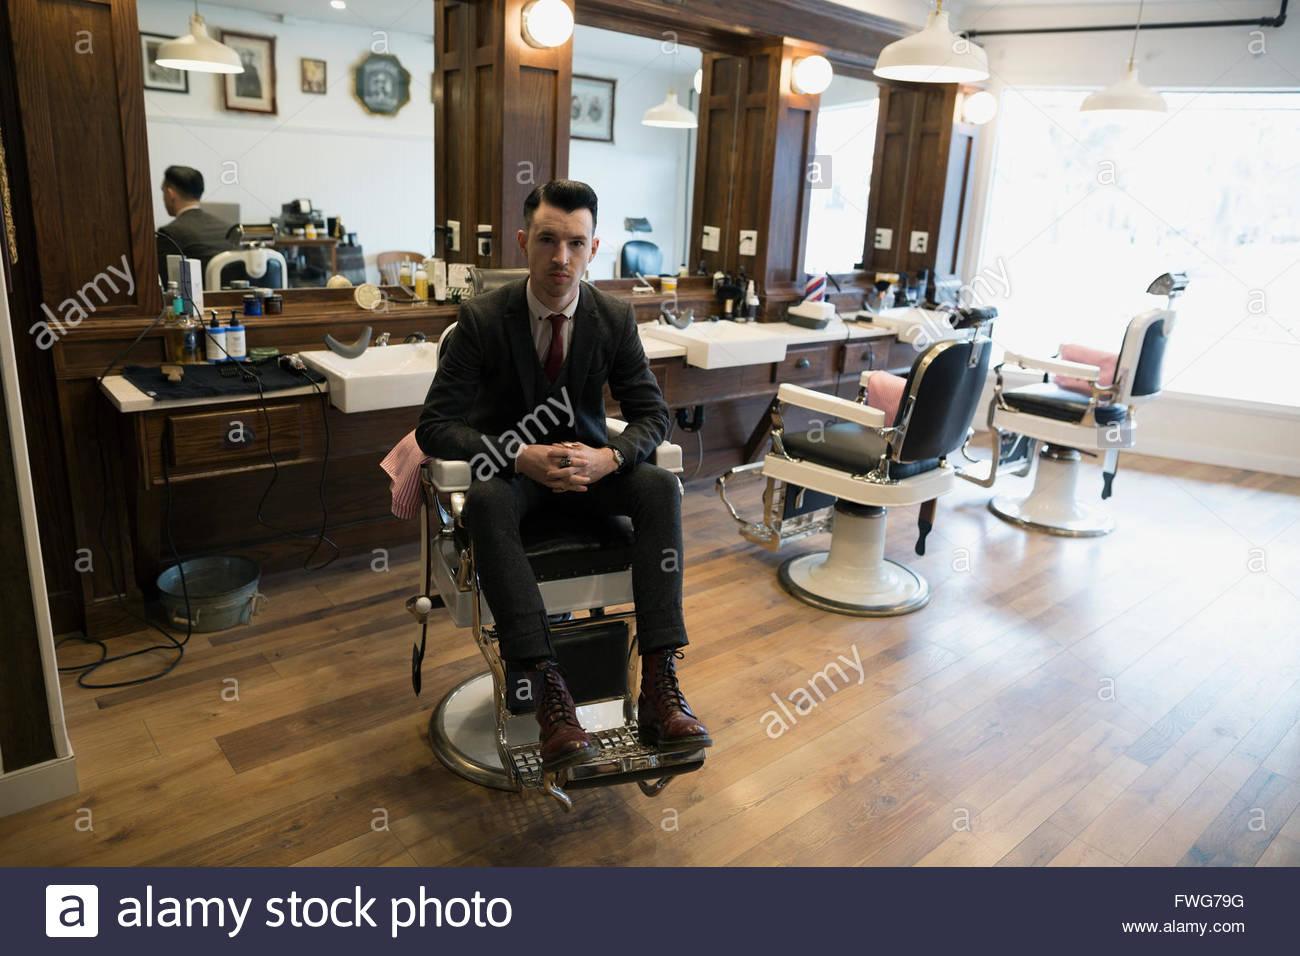 Portrait confident barber wearing suit barber shop chair - Stock Image